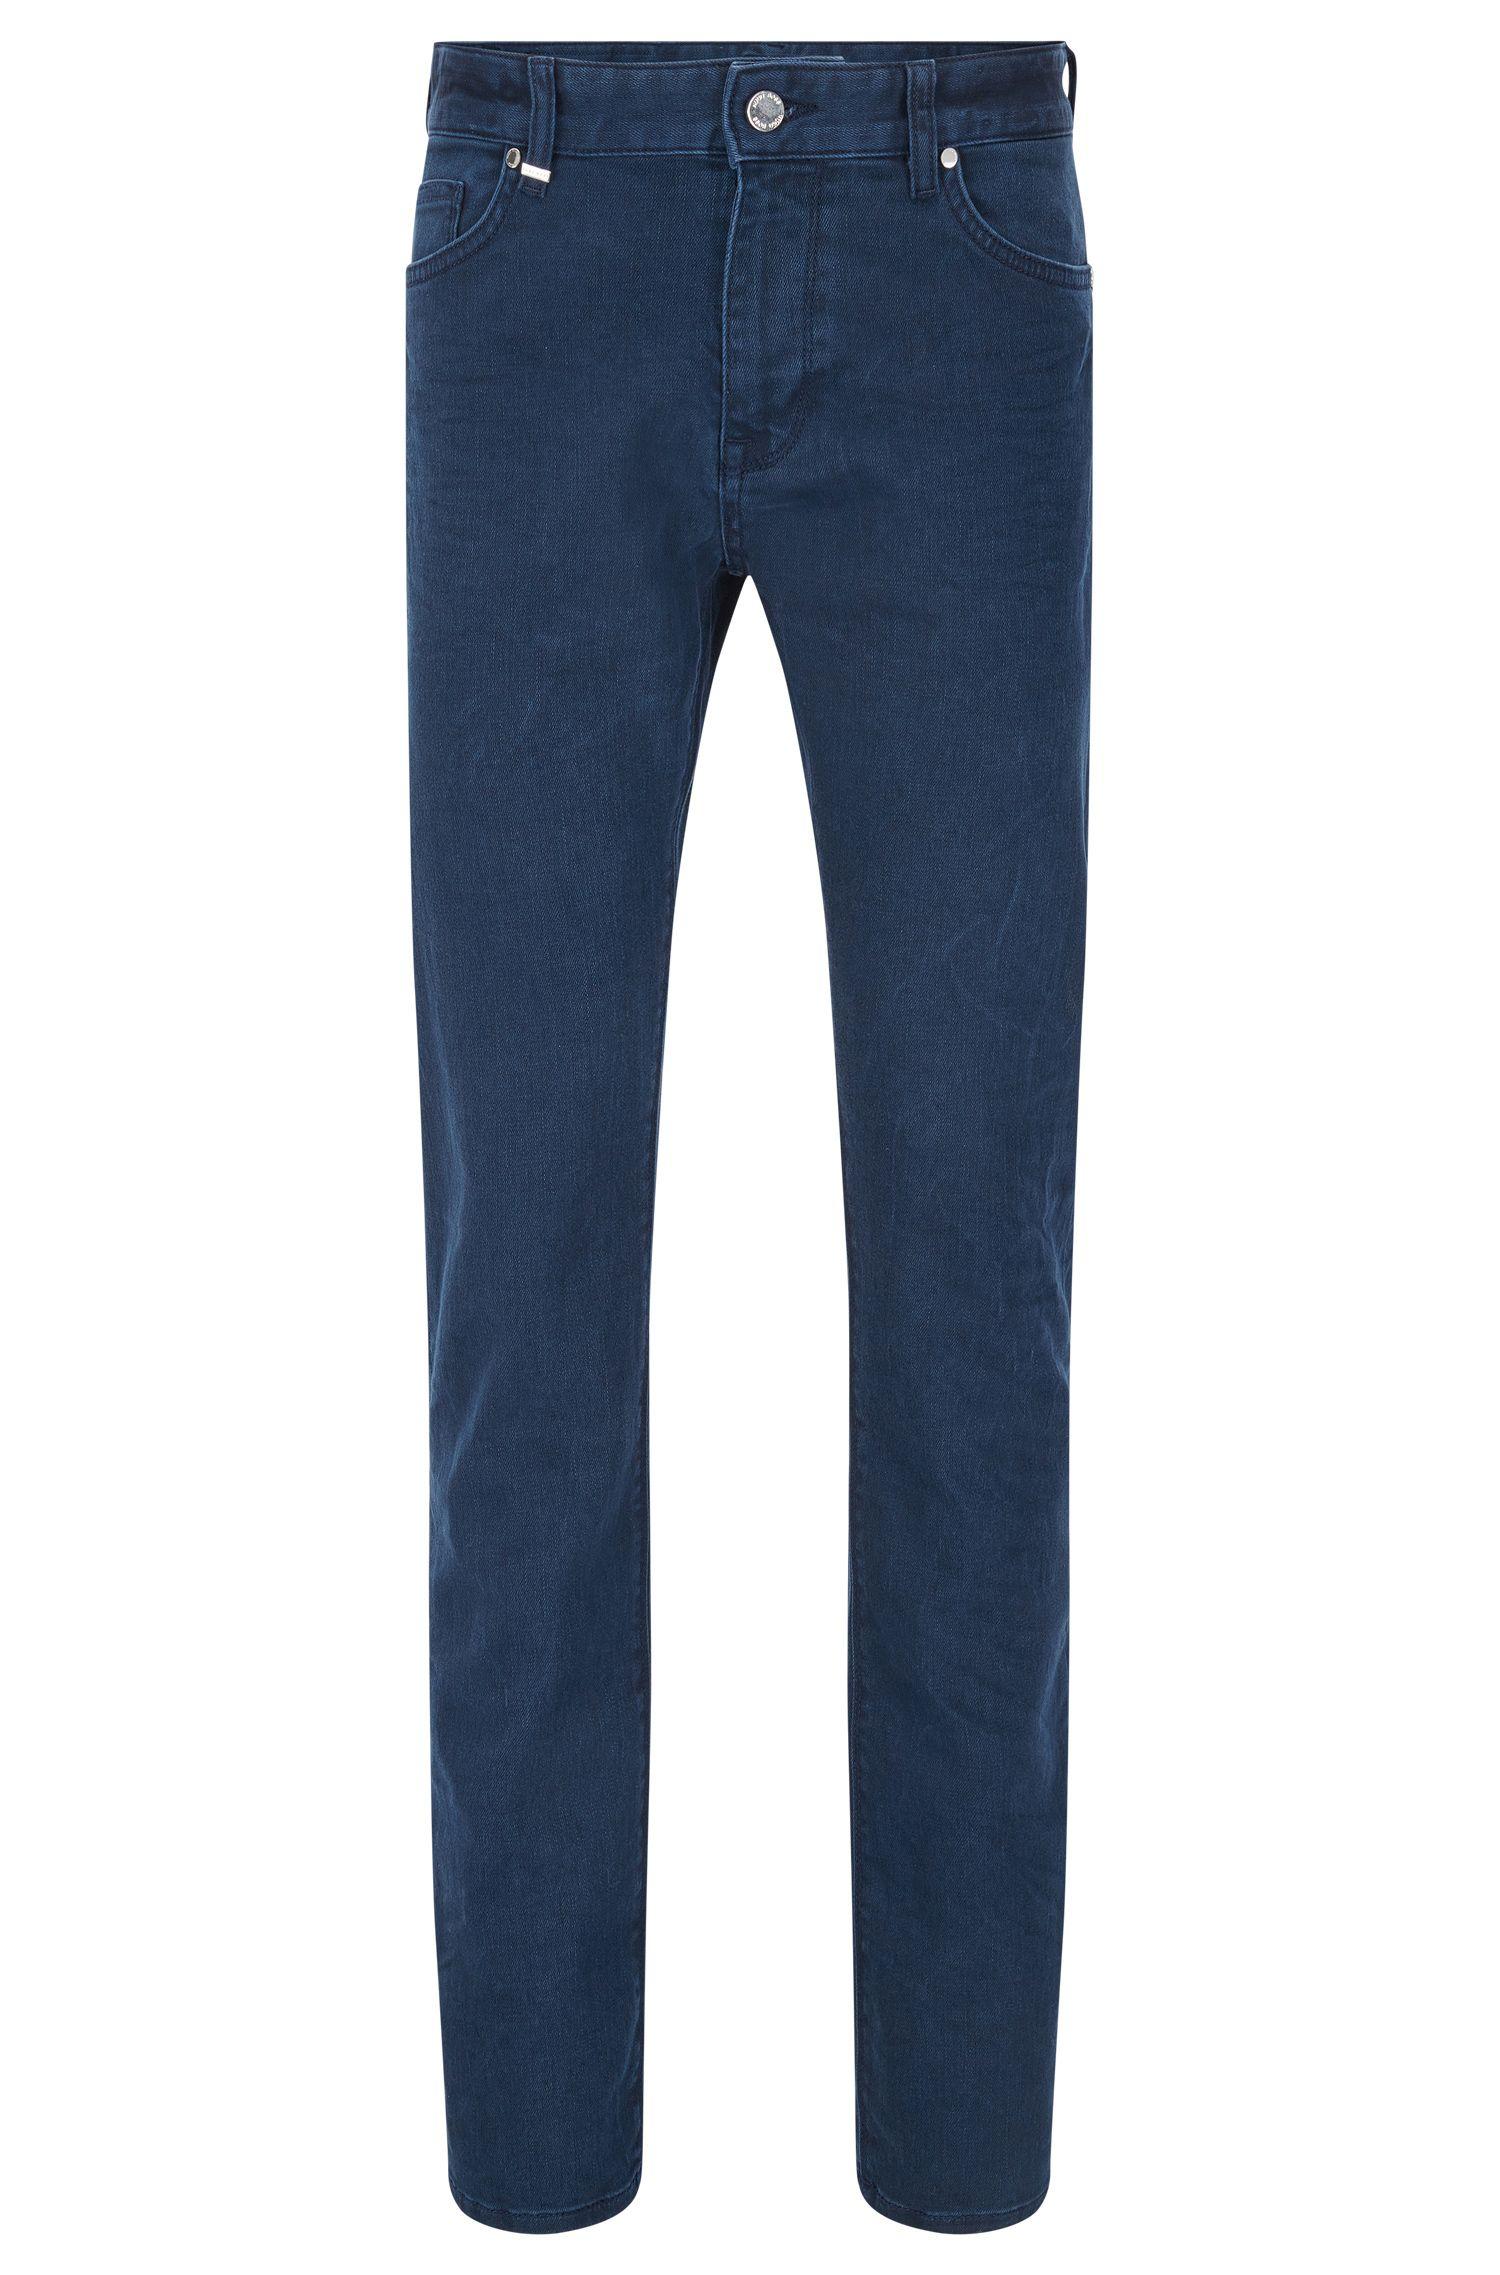 11.25 oz Stretch Cotton Jeans, Regular Fit   Maine